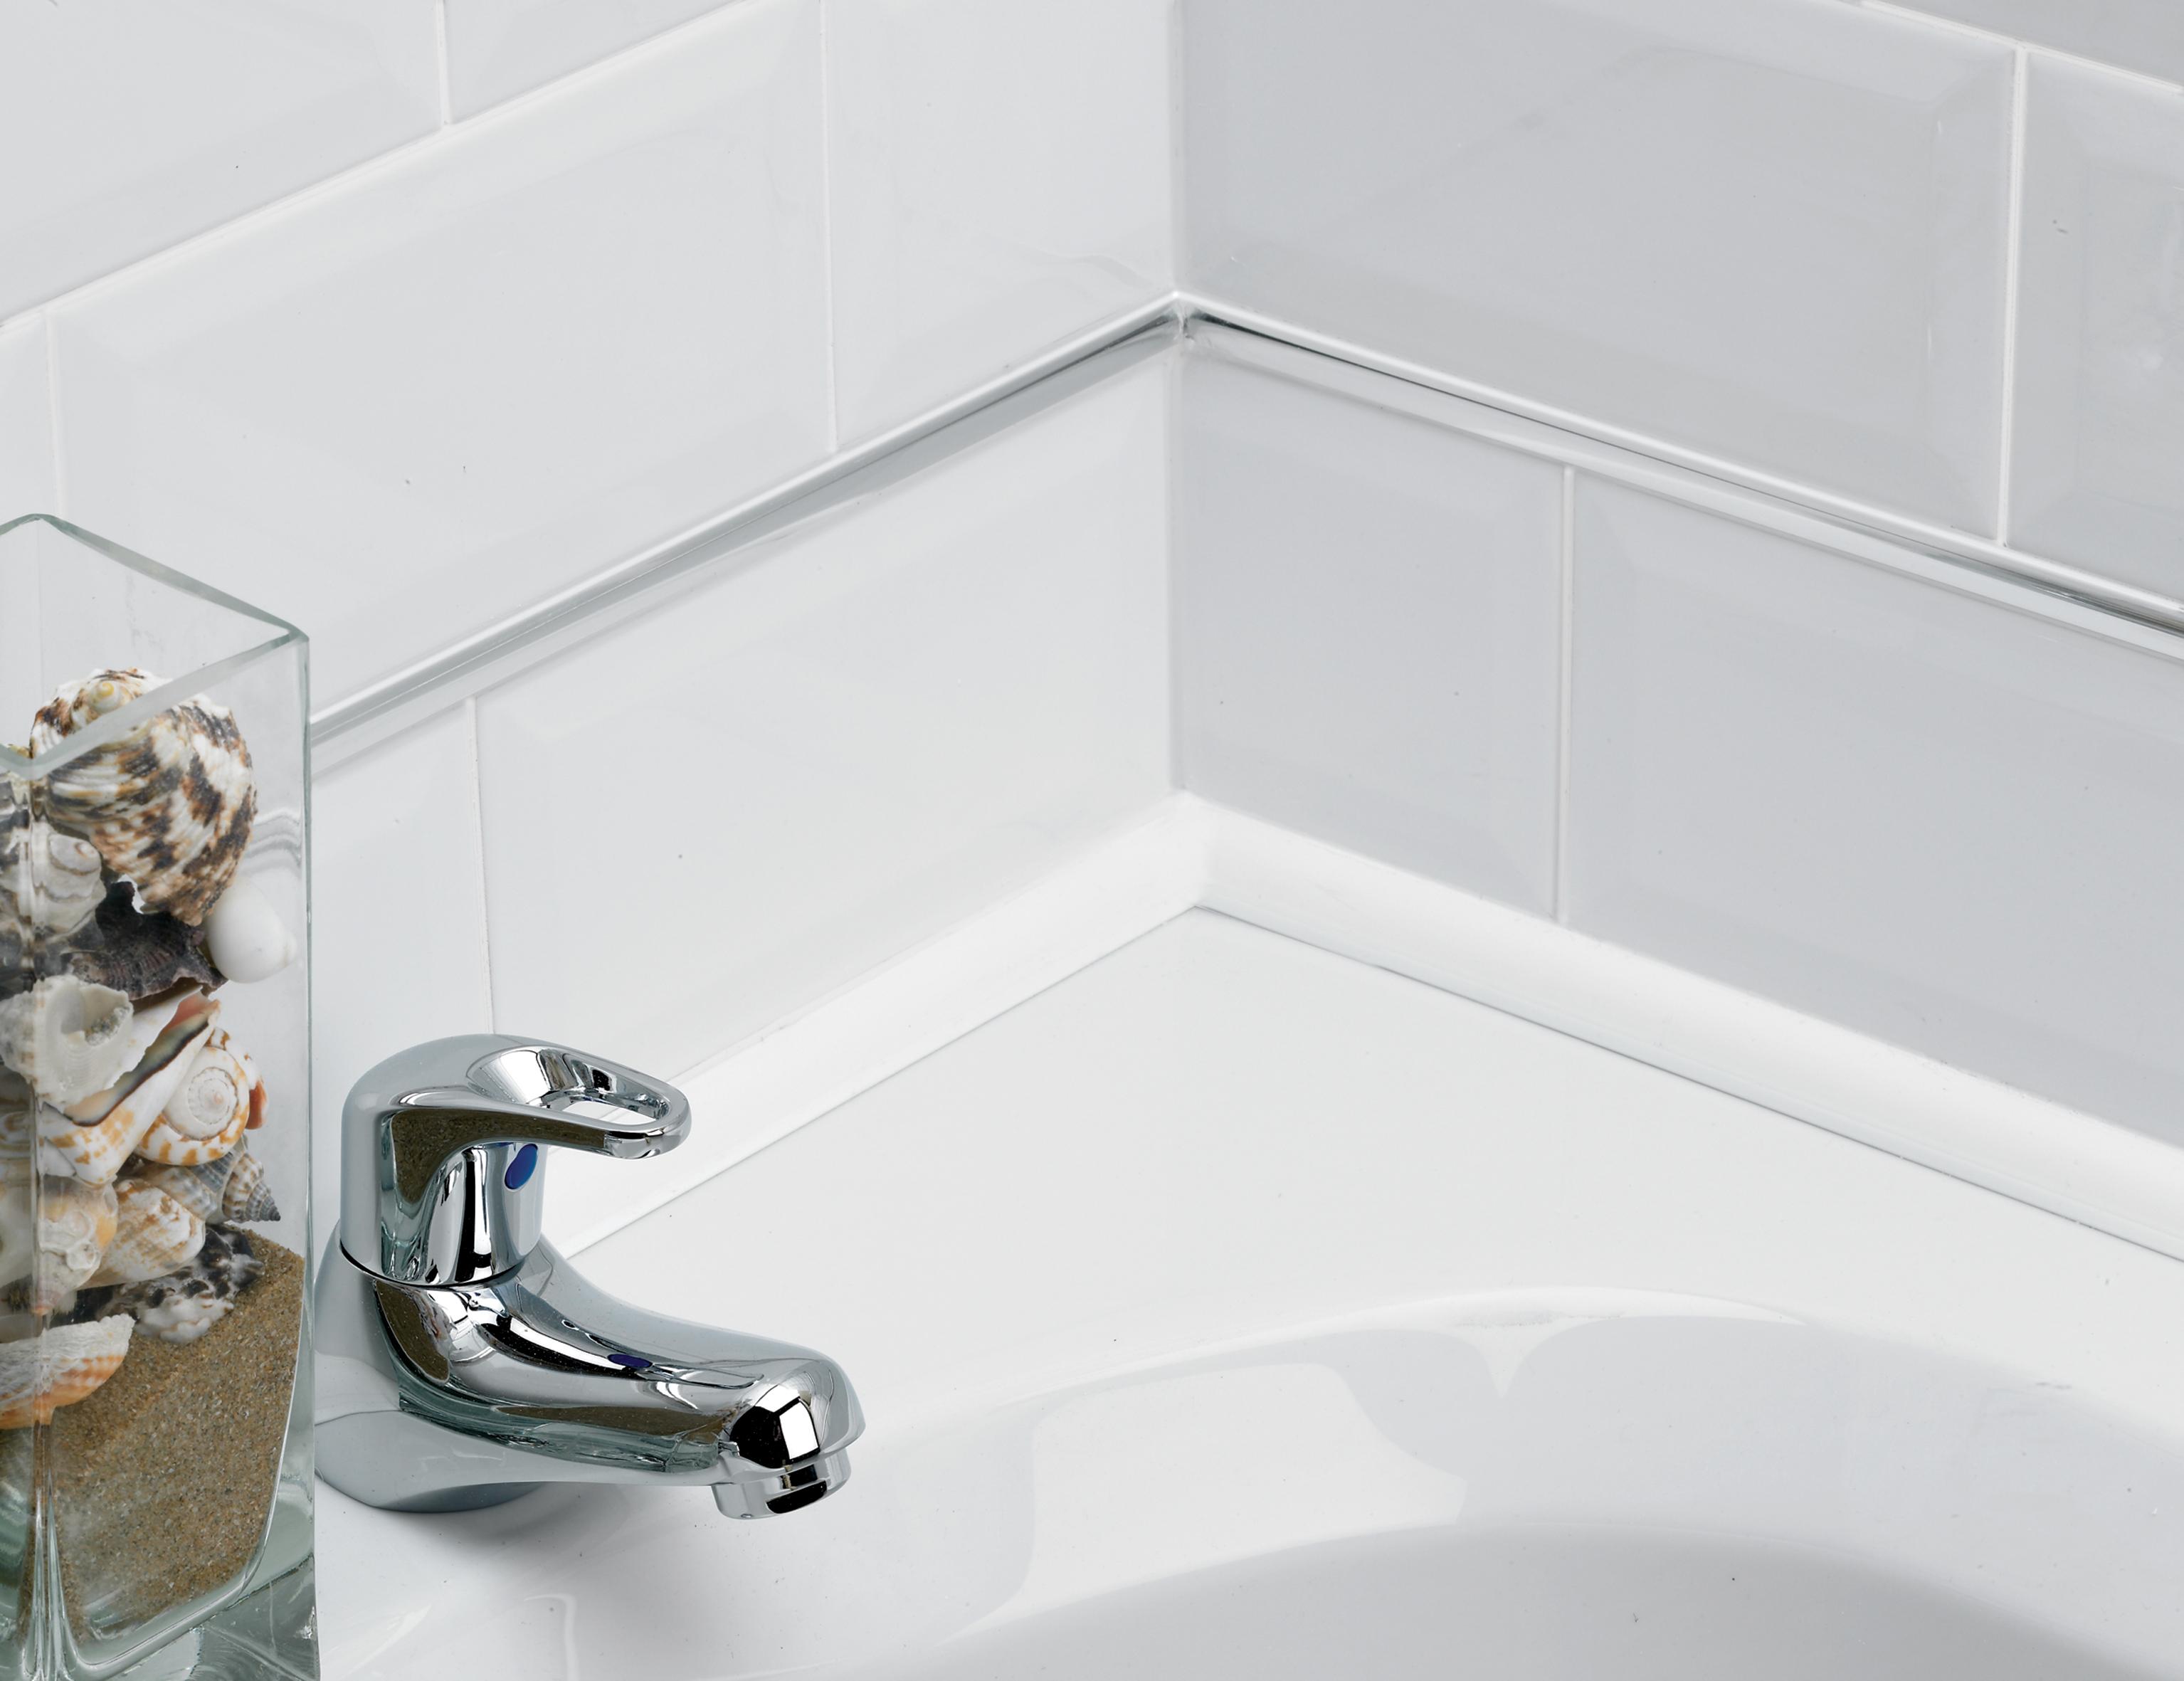 Peel And Stick Caulk Bathroom Sealing Trim Strip For Bathtub Buy Bathroom Sealing Trim Strip Caulk Strip For Bathtub Peel And Stick Caulking Tape Product On Alibaba Com